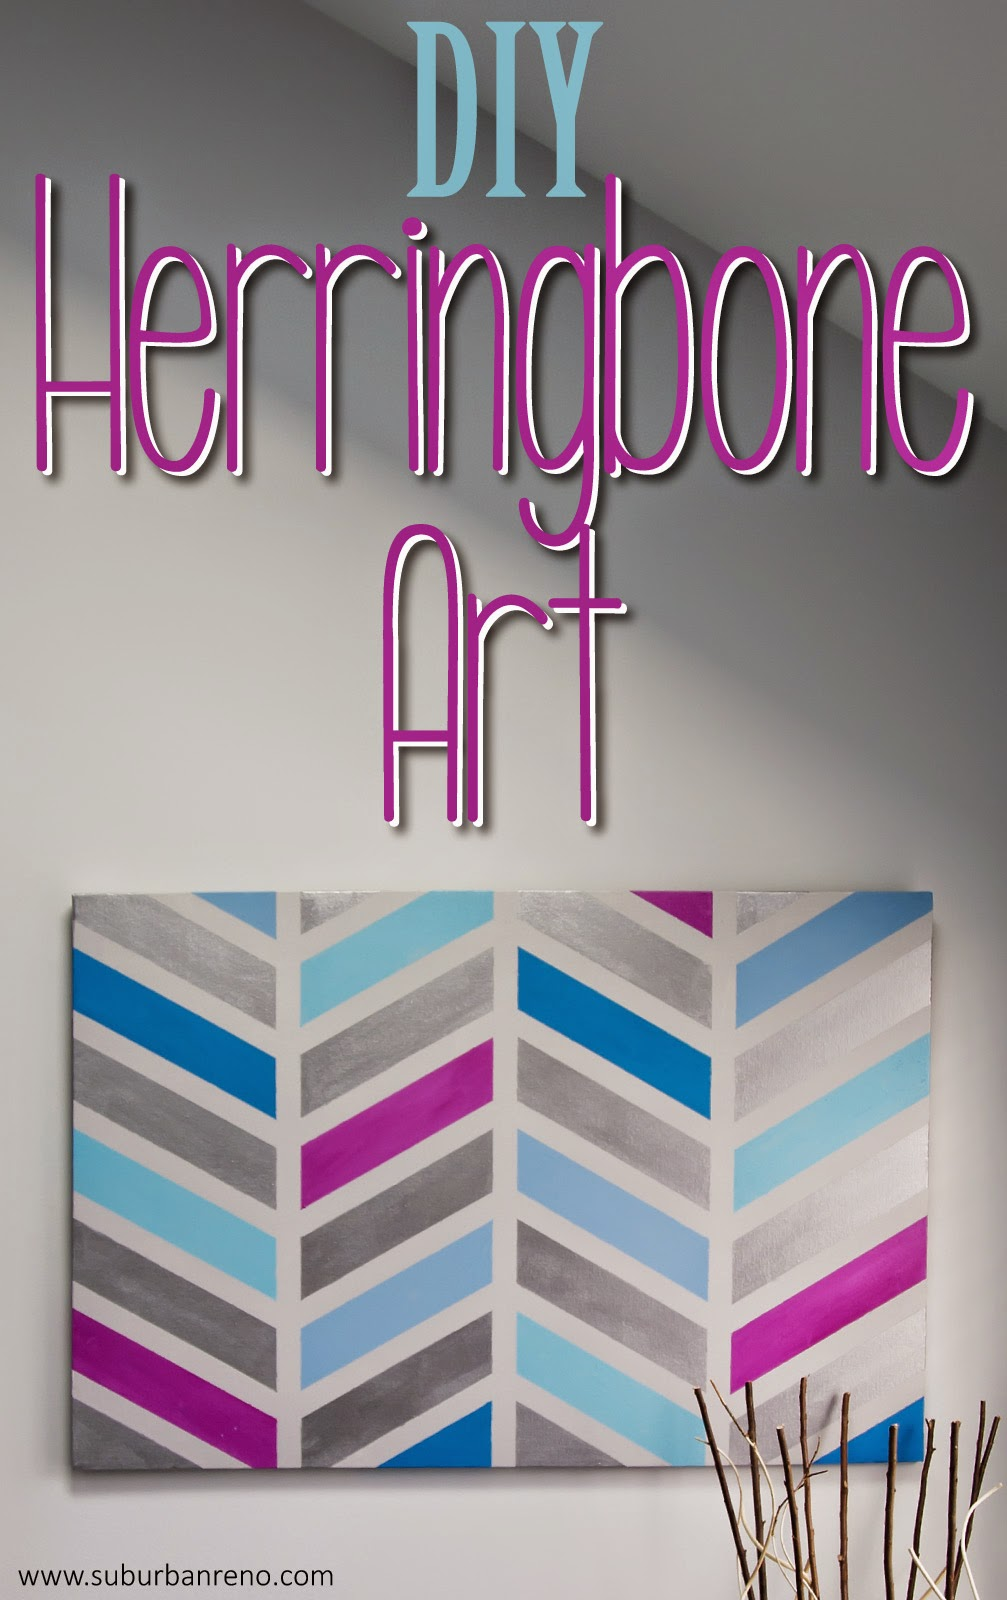 DIY Herringbone Art